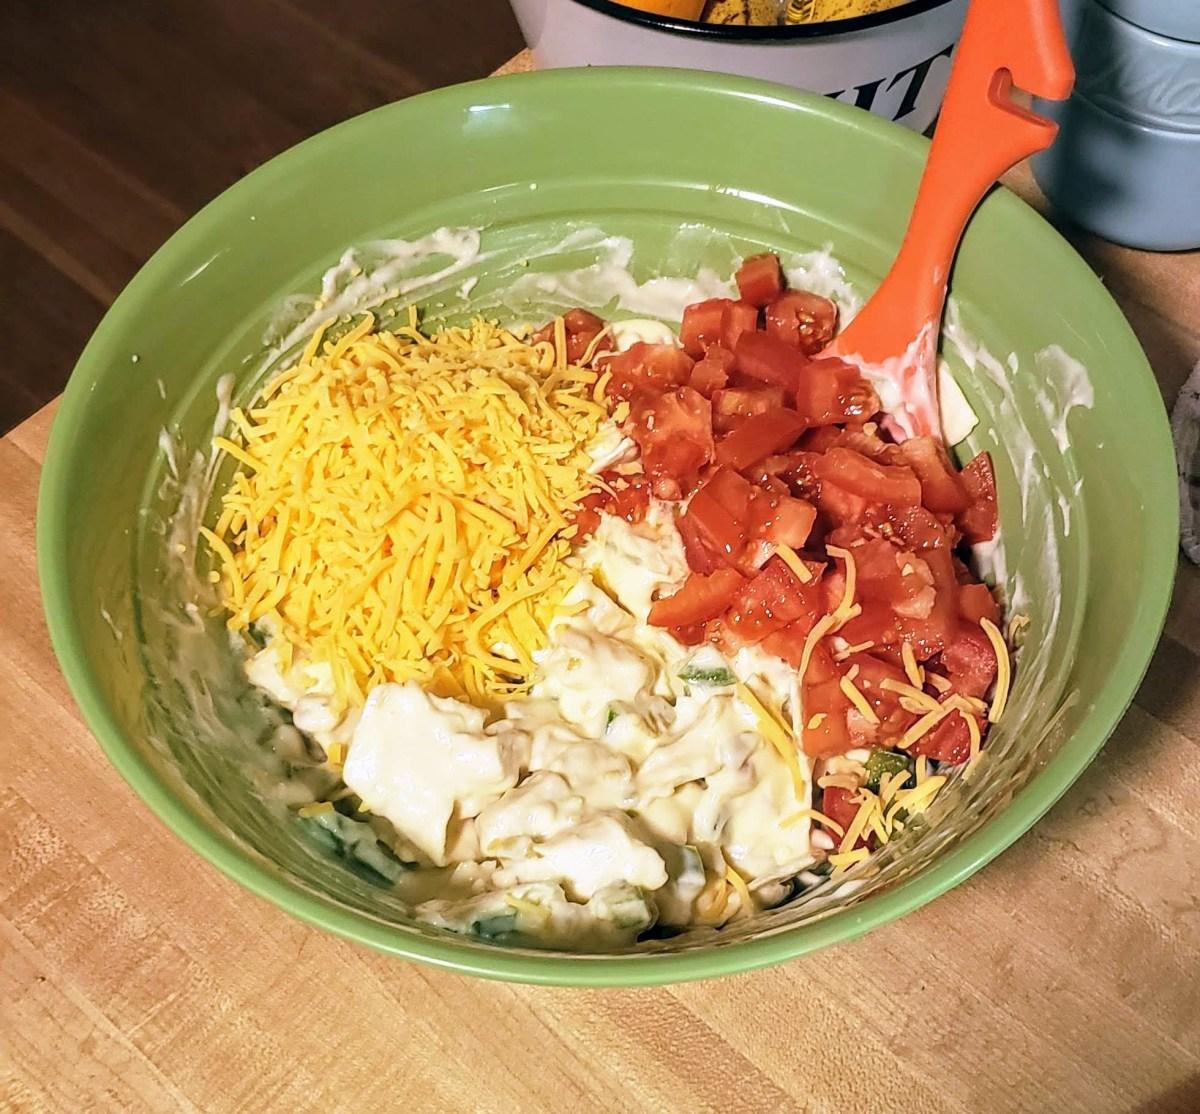 How to make skinny chicken casserole